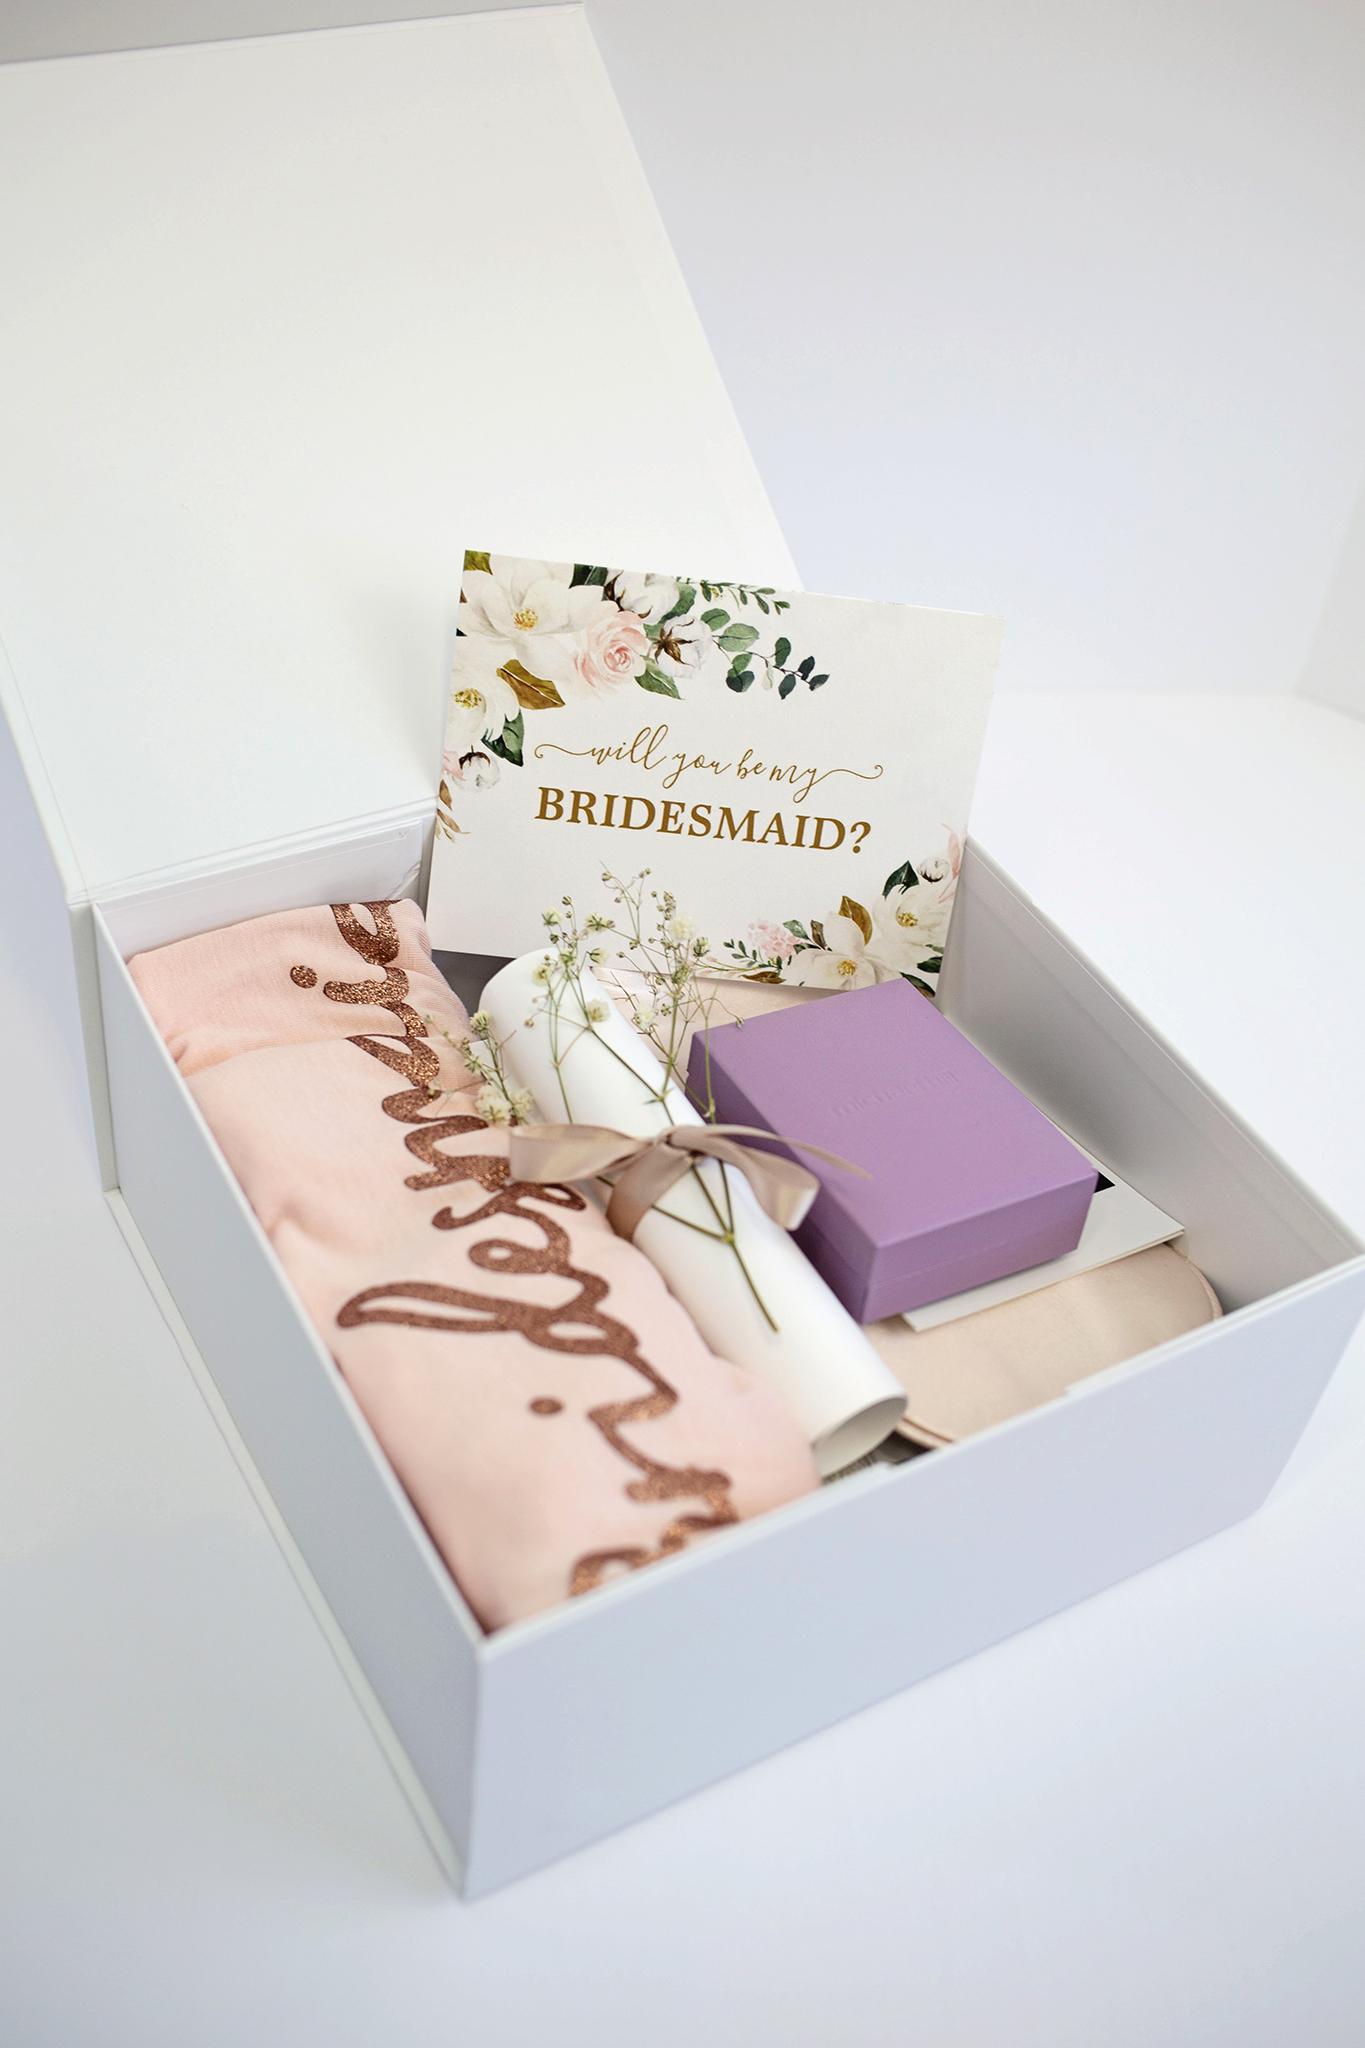 Finished bridesmaid proposal box